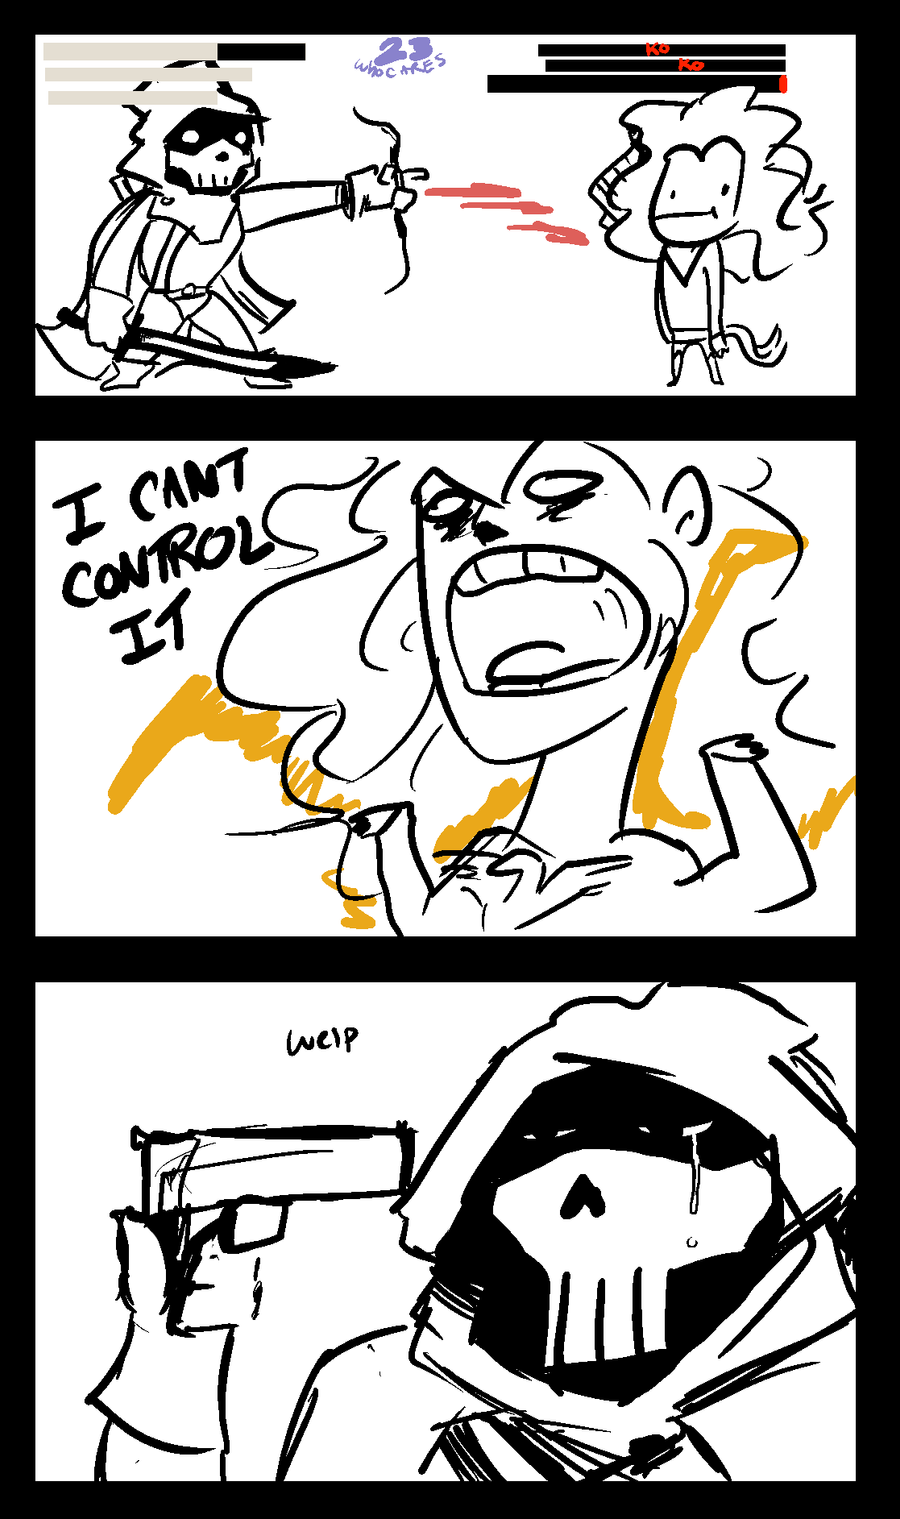 Capcom vs. Whatever / Memes - TV Tropes